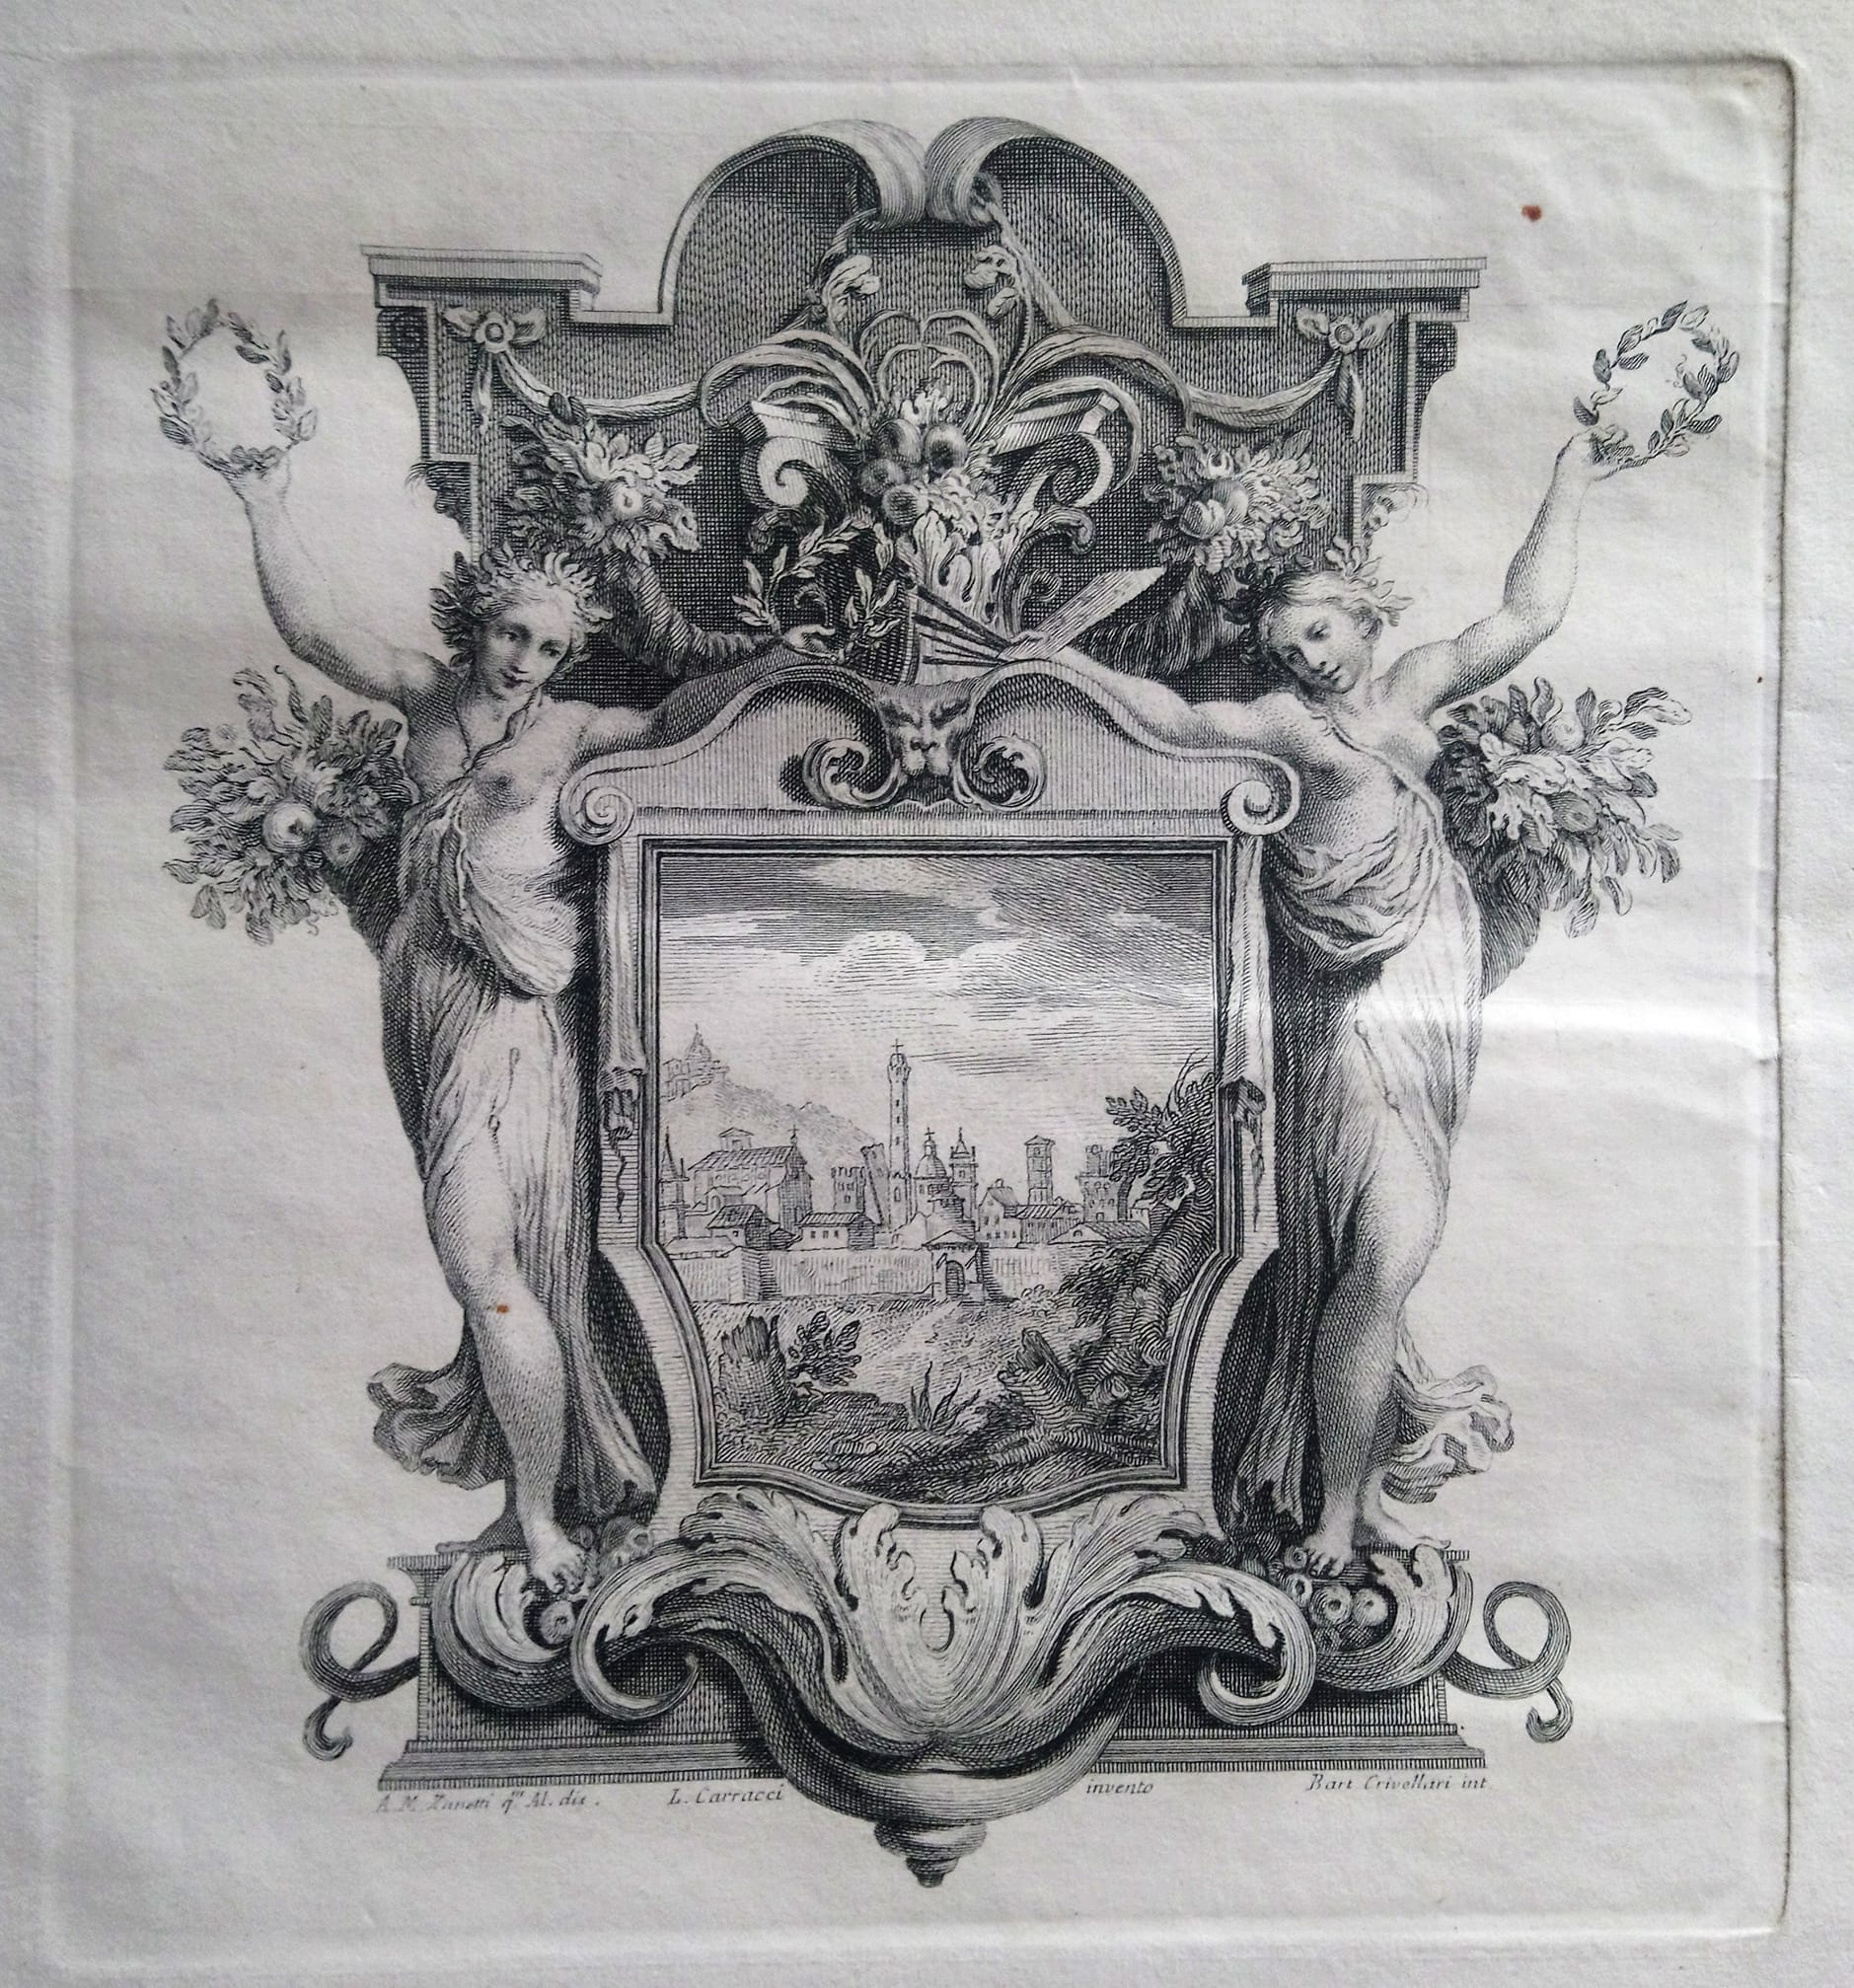 Crivellari 1756